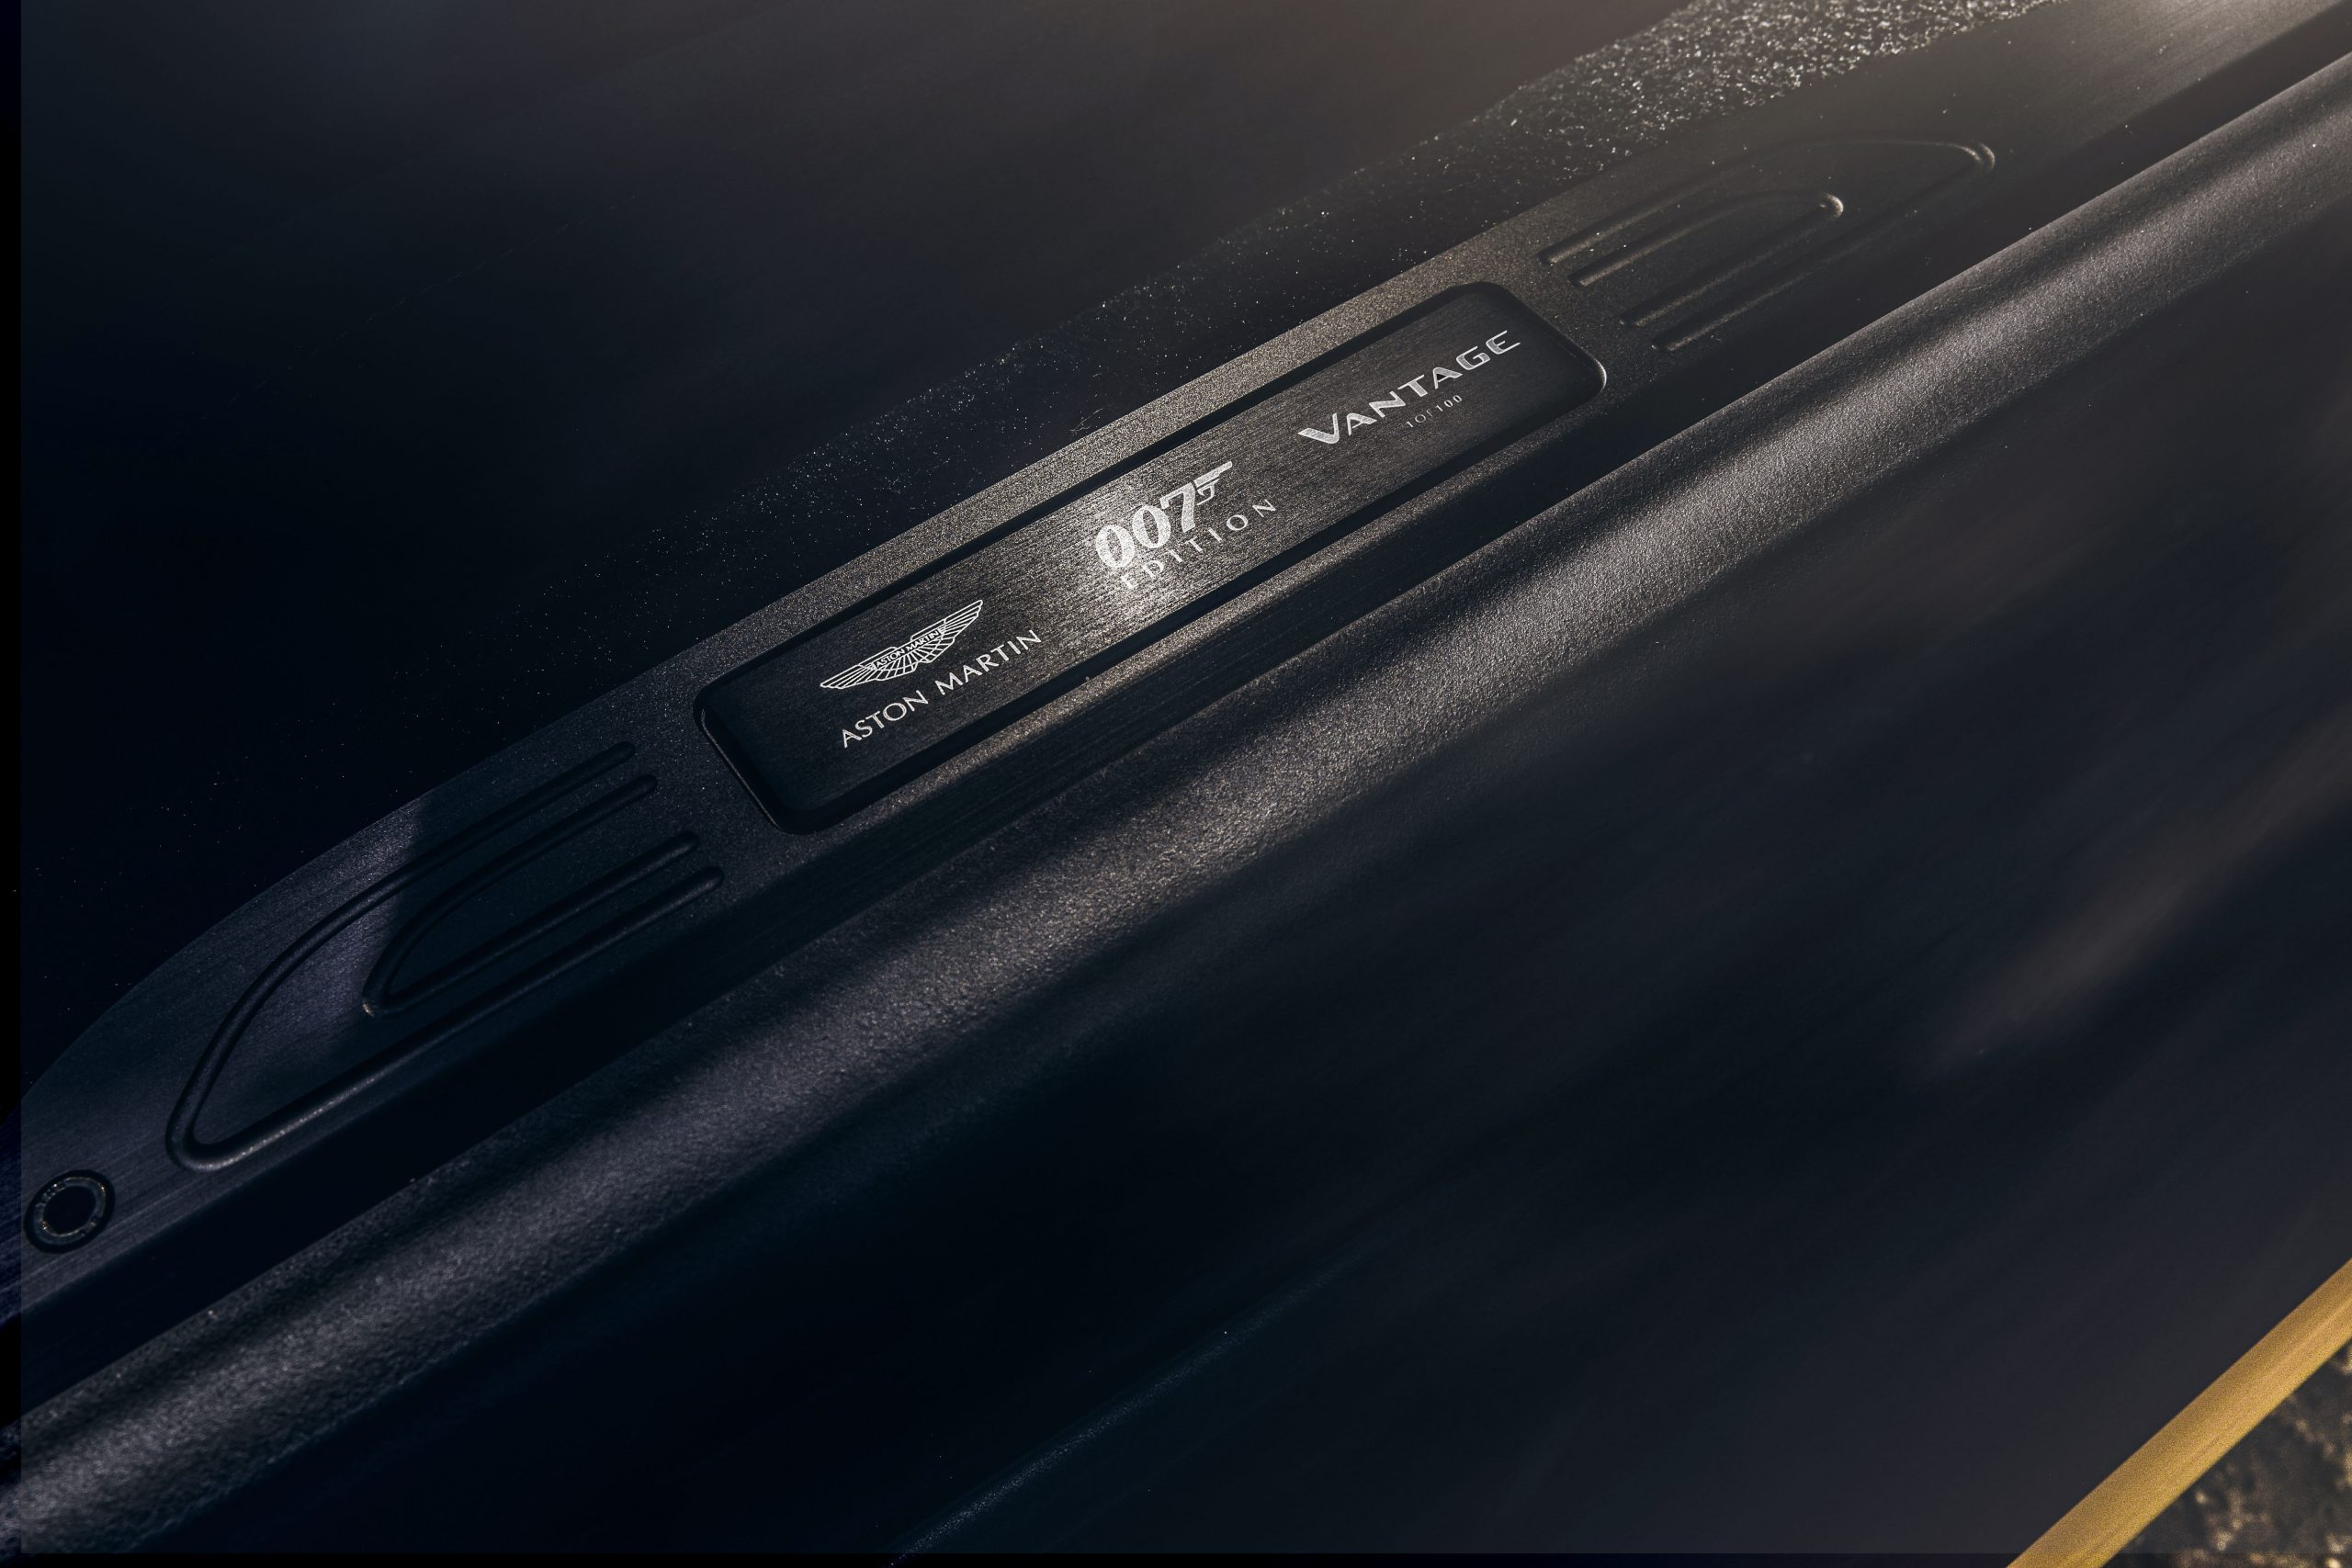 Aston Martin Vantage 007 Edition badge